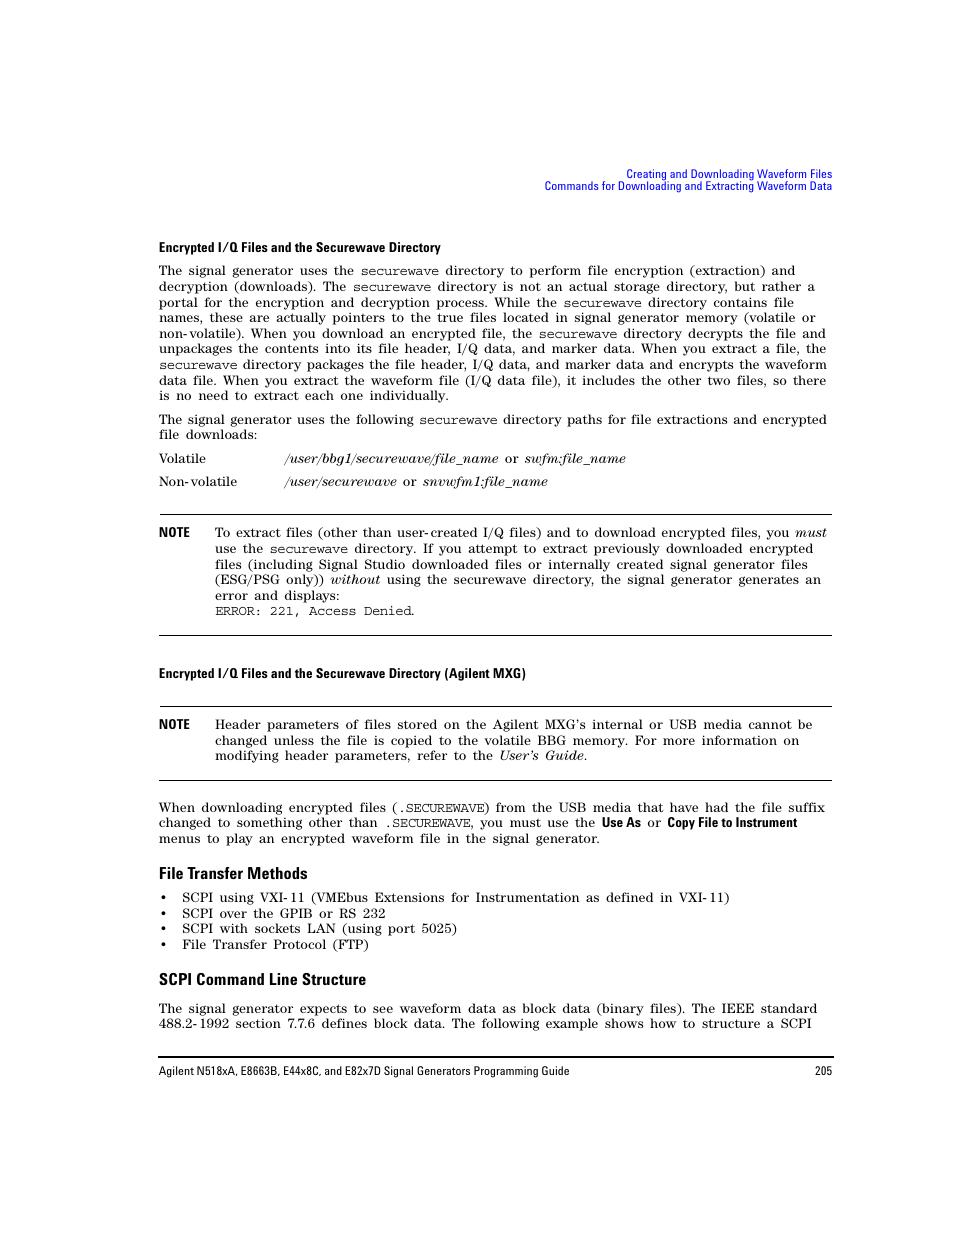 File transfer methods, Scpi command line structure   Agilent